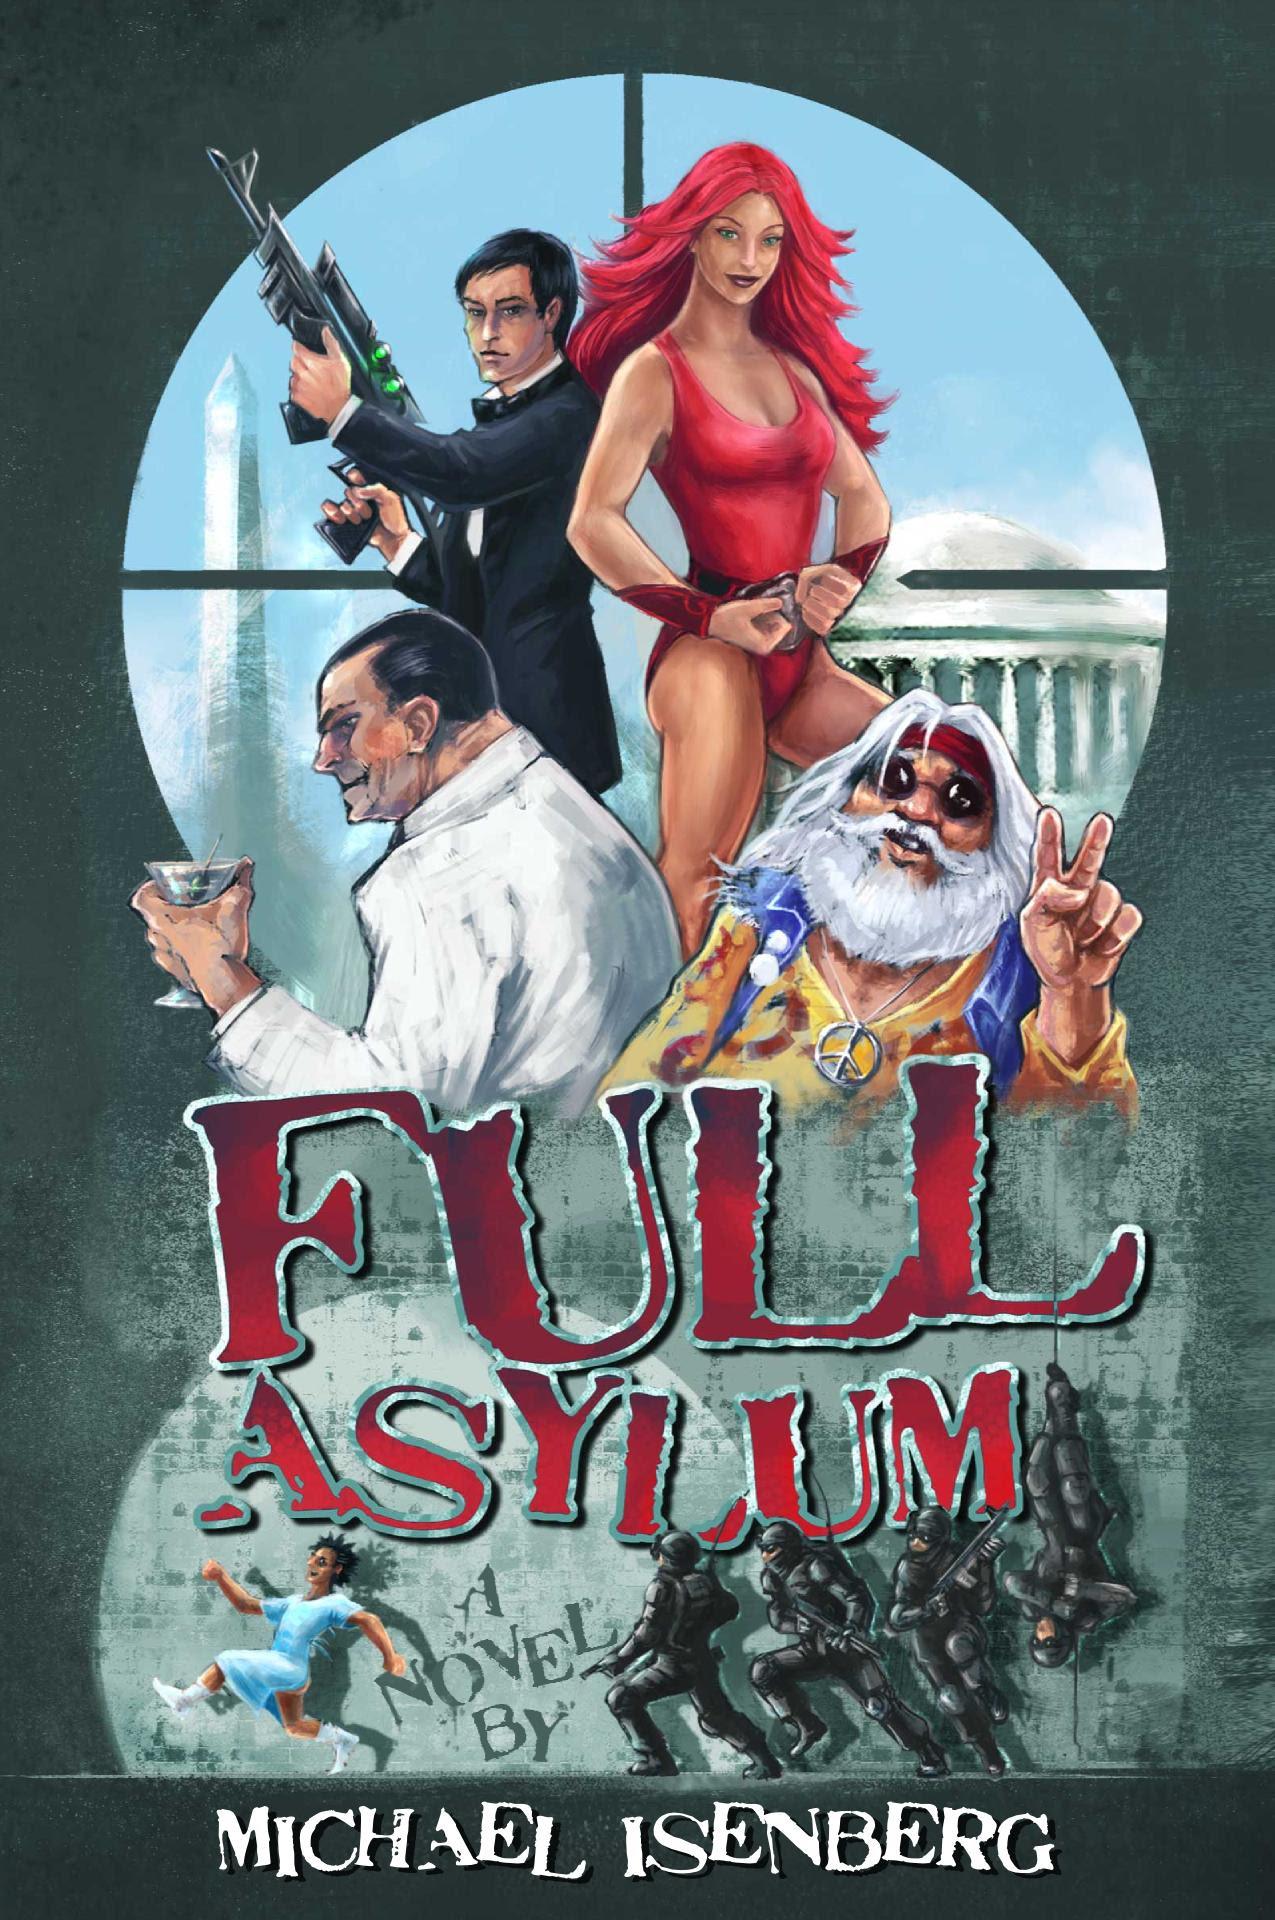 Full Asylum by Michael Isenberg